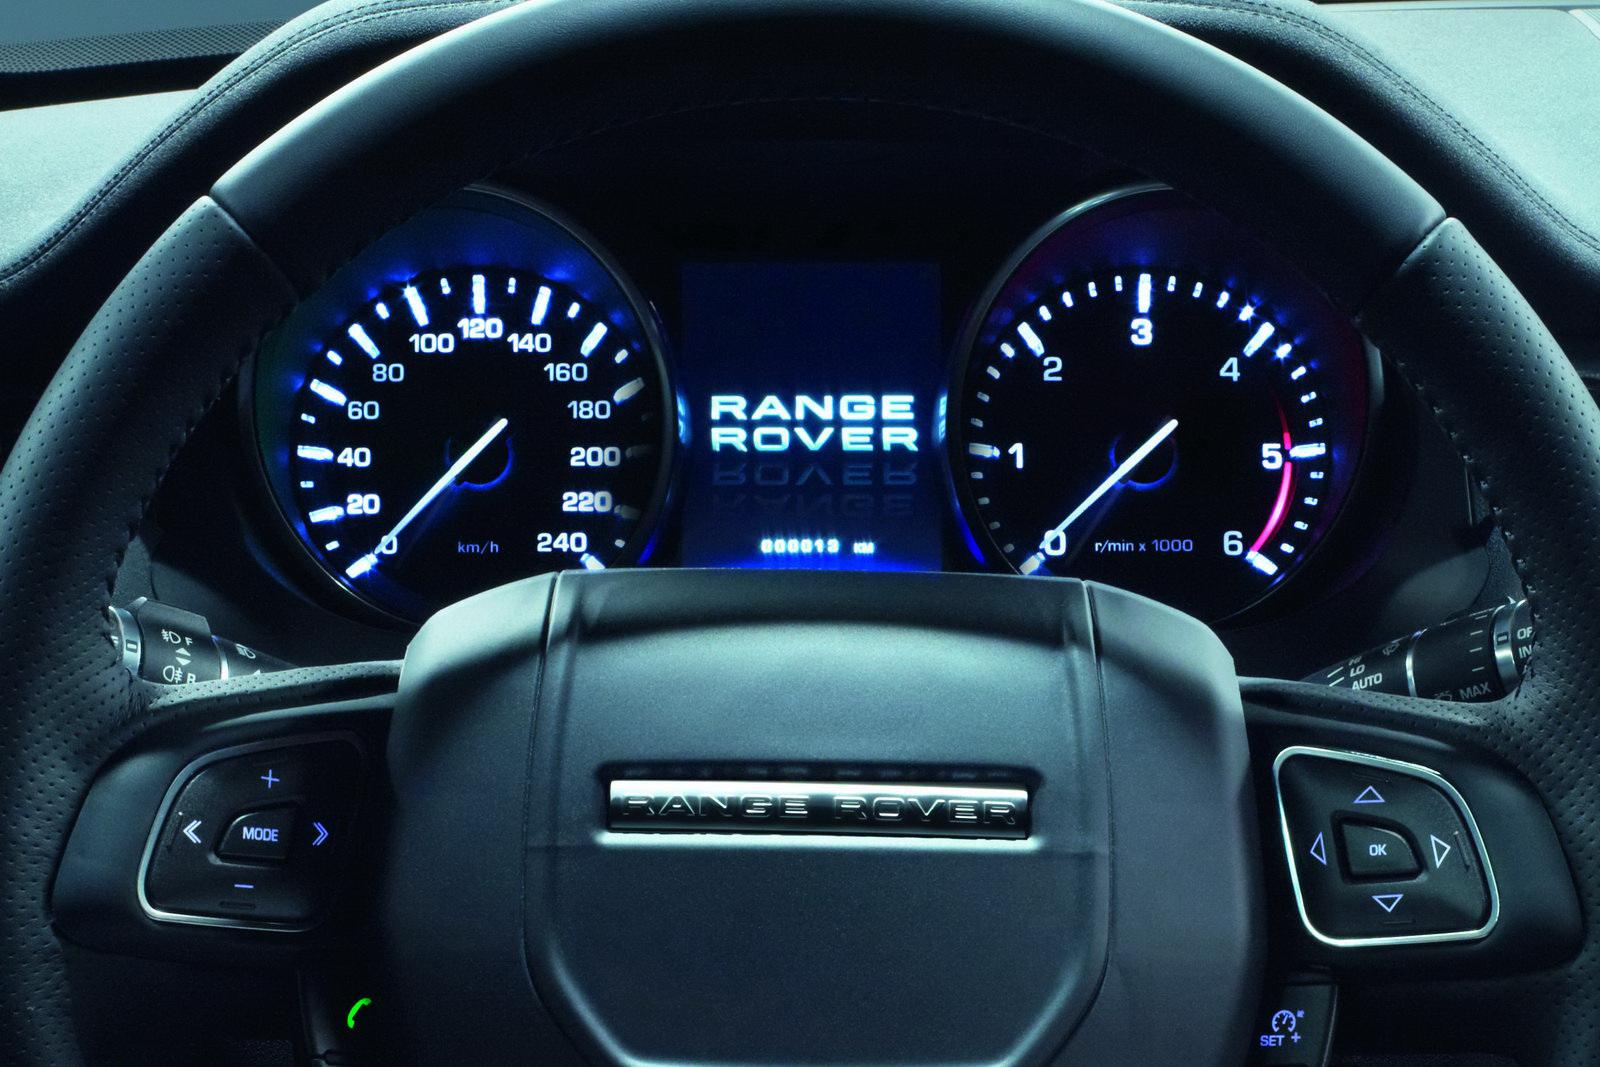 http://1.bp.blogspot.com/-7PnThhOlCfA/Tj8xM7RUZMI/AAAAAAAAAEQ/4ARvC56dYt0/s1600/2012-Land-Rover-Range-Rover-Evoque-5-door-Speedometer.jpg